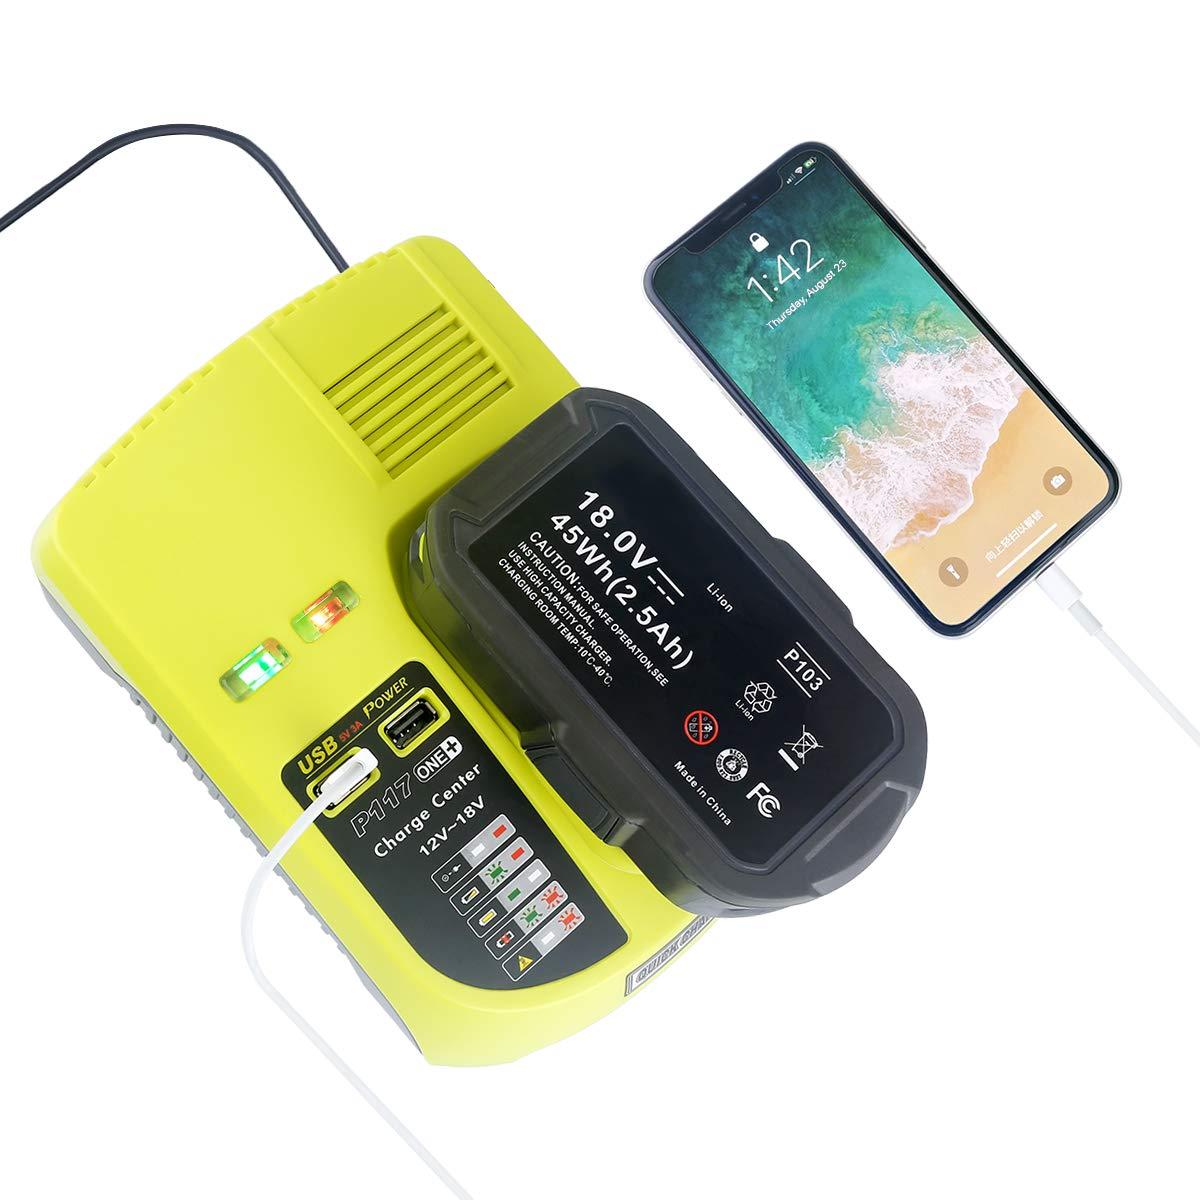 P117 Dual Chemistry IntelliPort Charger Li-ion /& Ni-cad Ni-Mh Battery Charger 12V 18V MAX For Ryobi ONE Plus 2 USB Ports